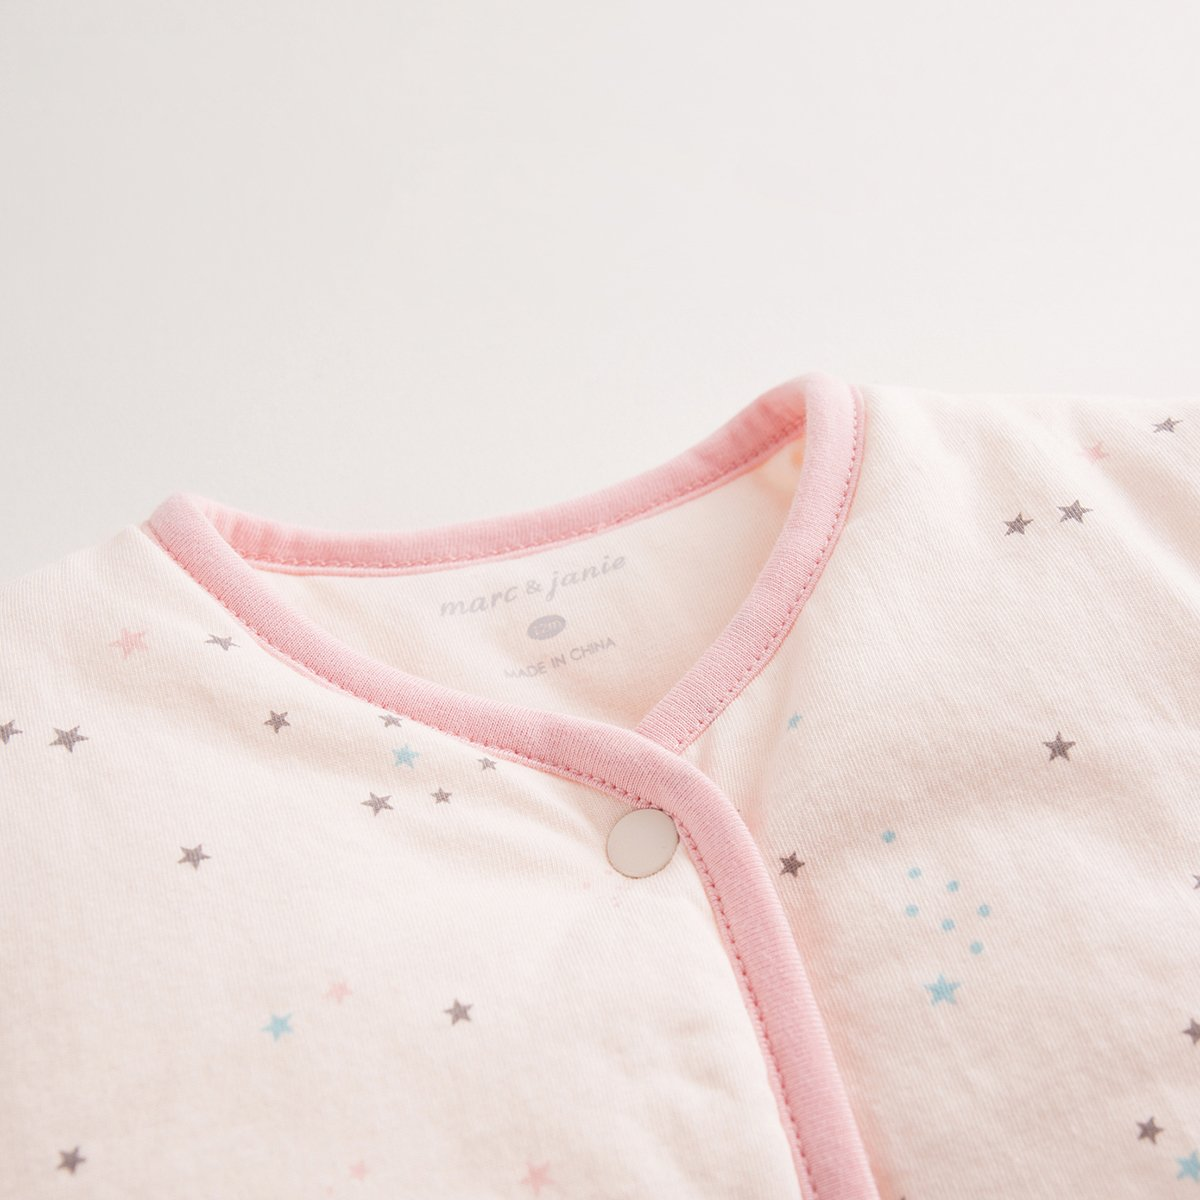 marc janie Baby Toddler Boys Girls Outerwear Cartoon Pattern Print Jacket Cotton-Padded Coat